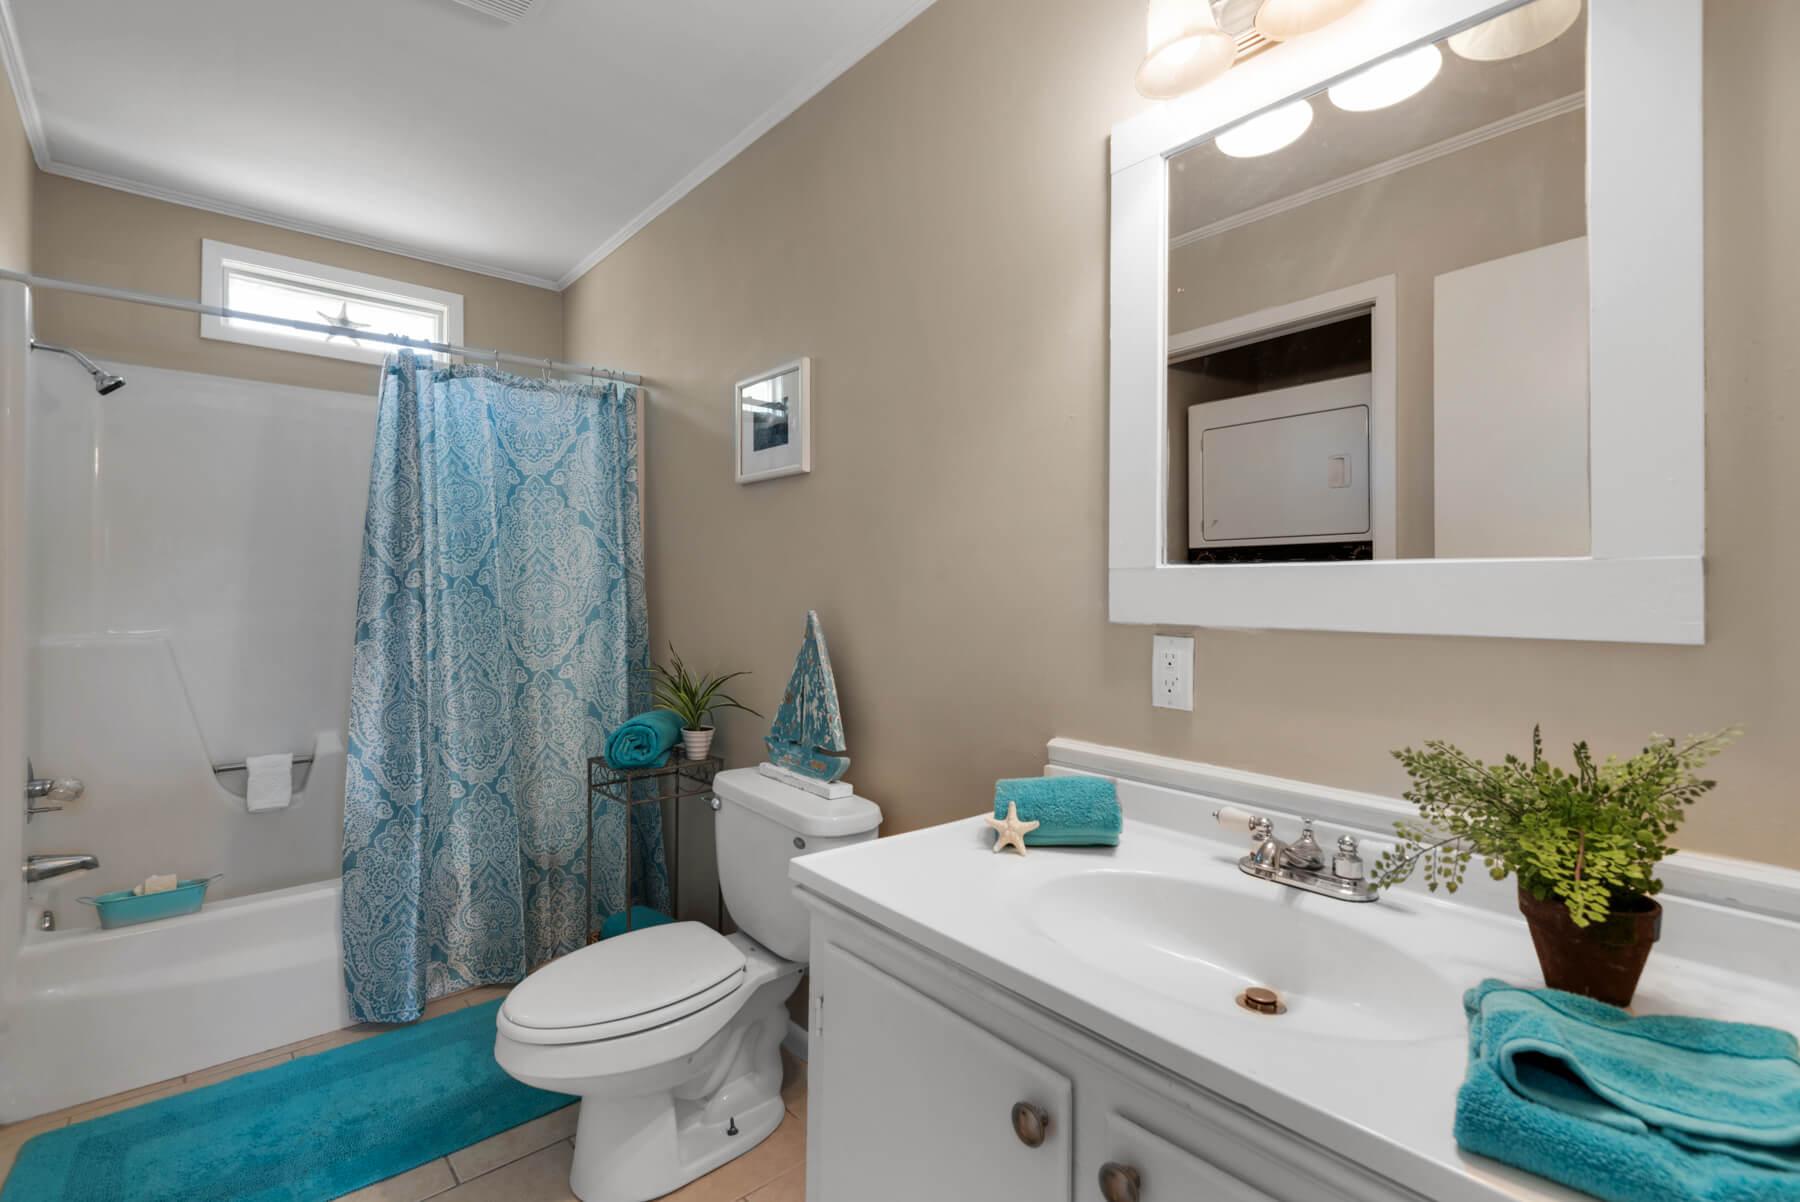 7466 Twin Beech Road Fairhope for Sale Urban Property bathroom view 1